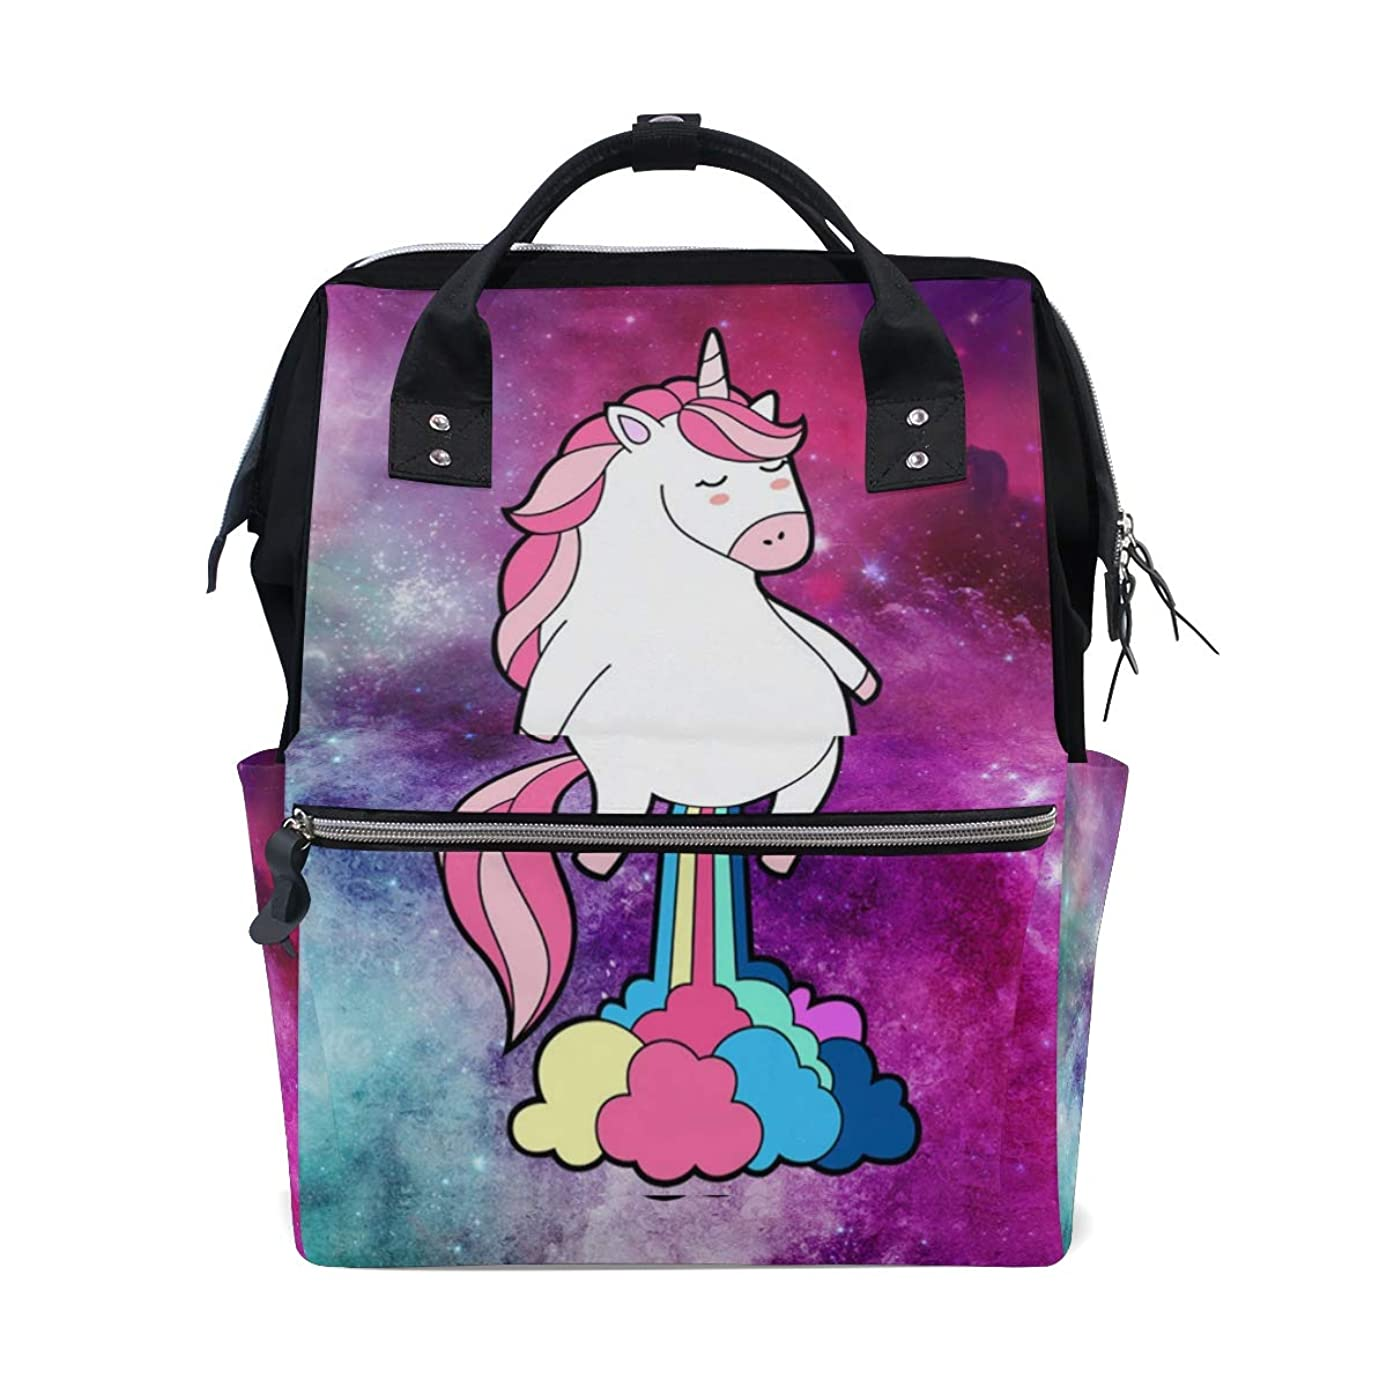 Backpack Funny Unicorn Galaxy Rainbow Fart School Rucksack Diaper Bags Travel Shoulder Large Capacity Bookbag for Women Men